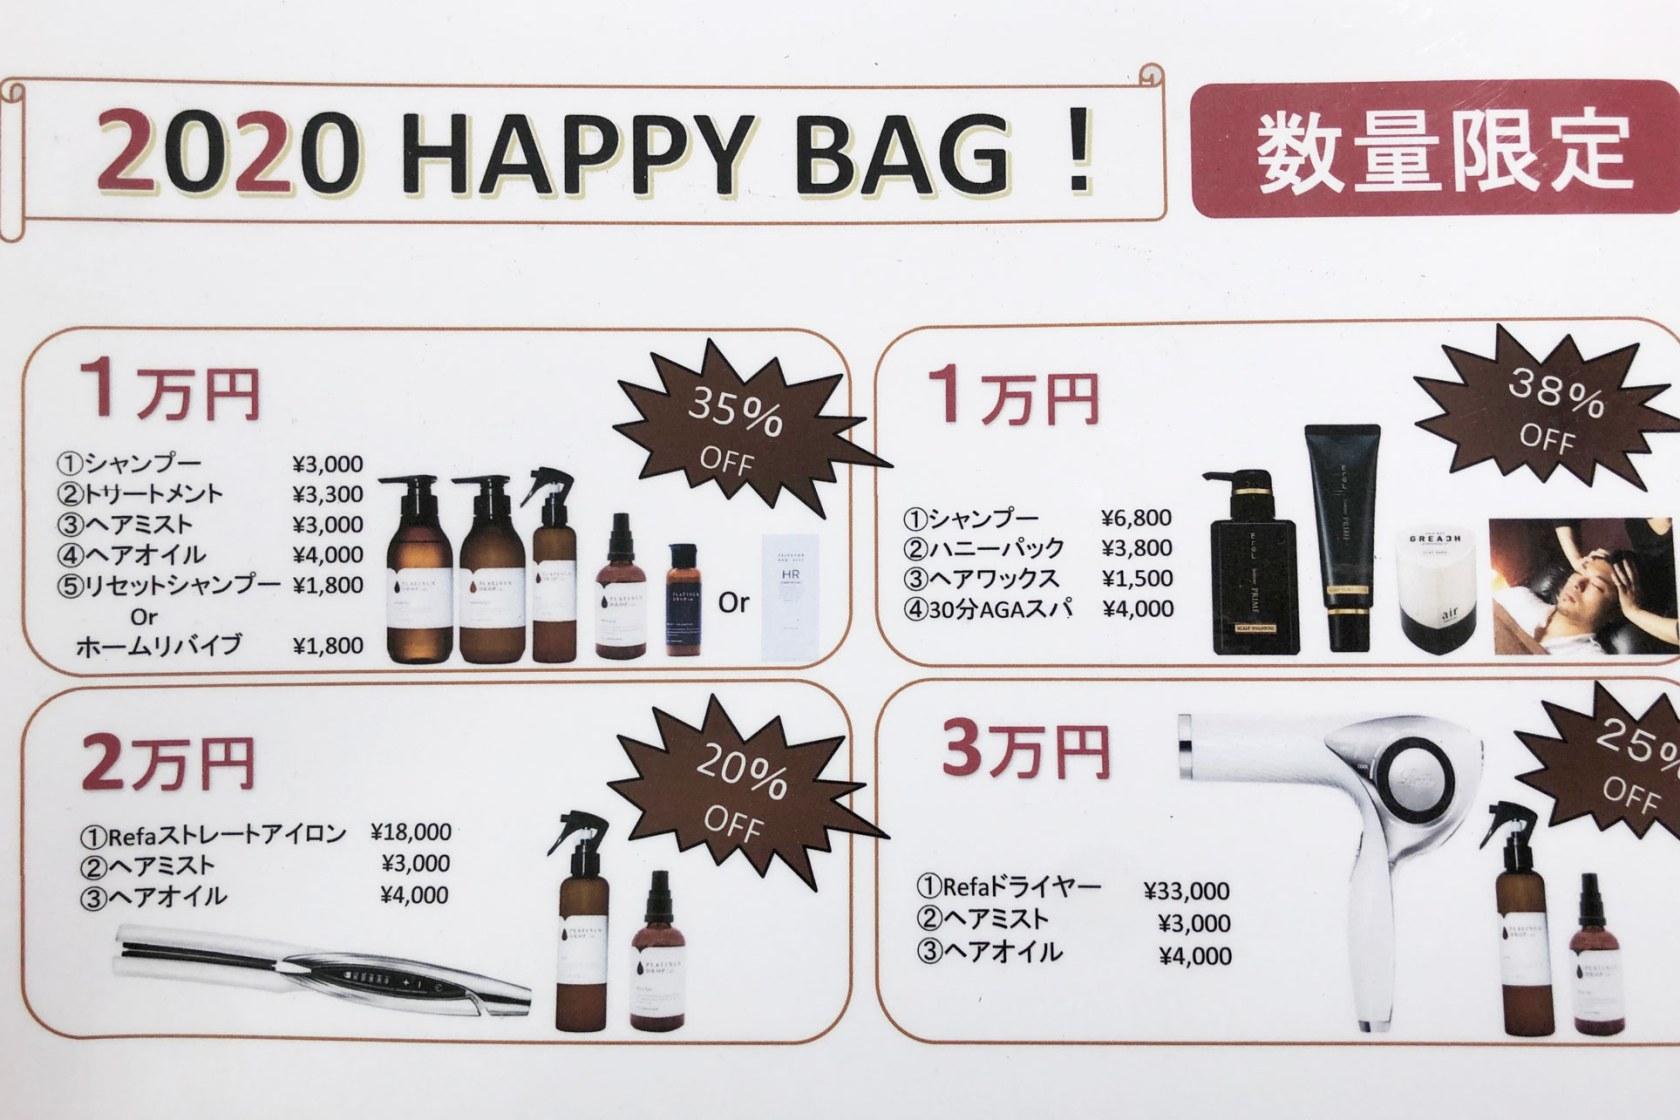 【air-GINZA】1月は超お得な福袋を販売中です!!その中身を大公開!!